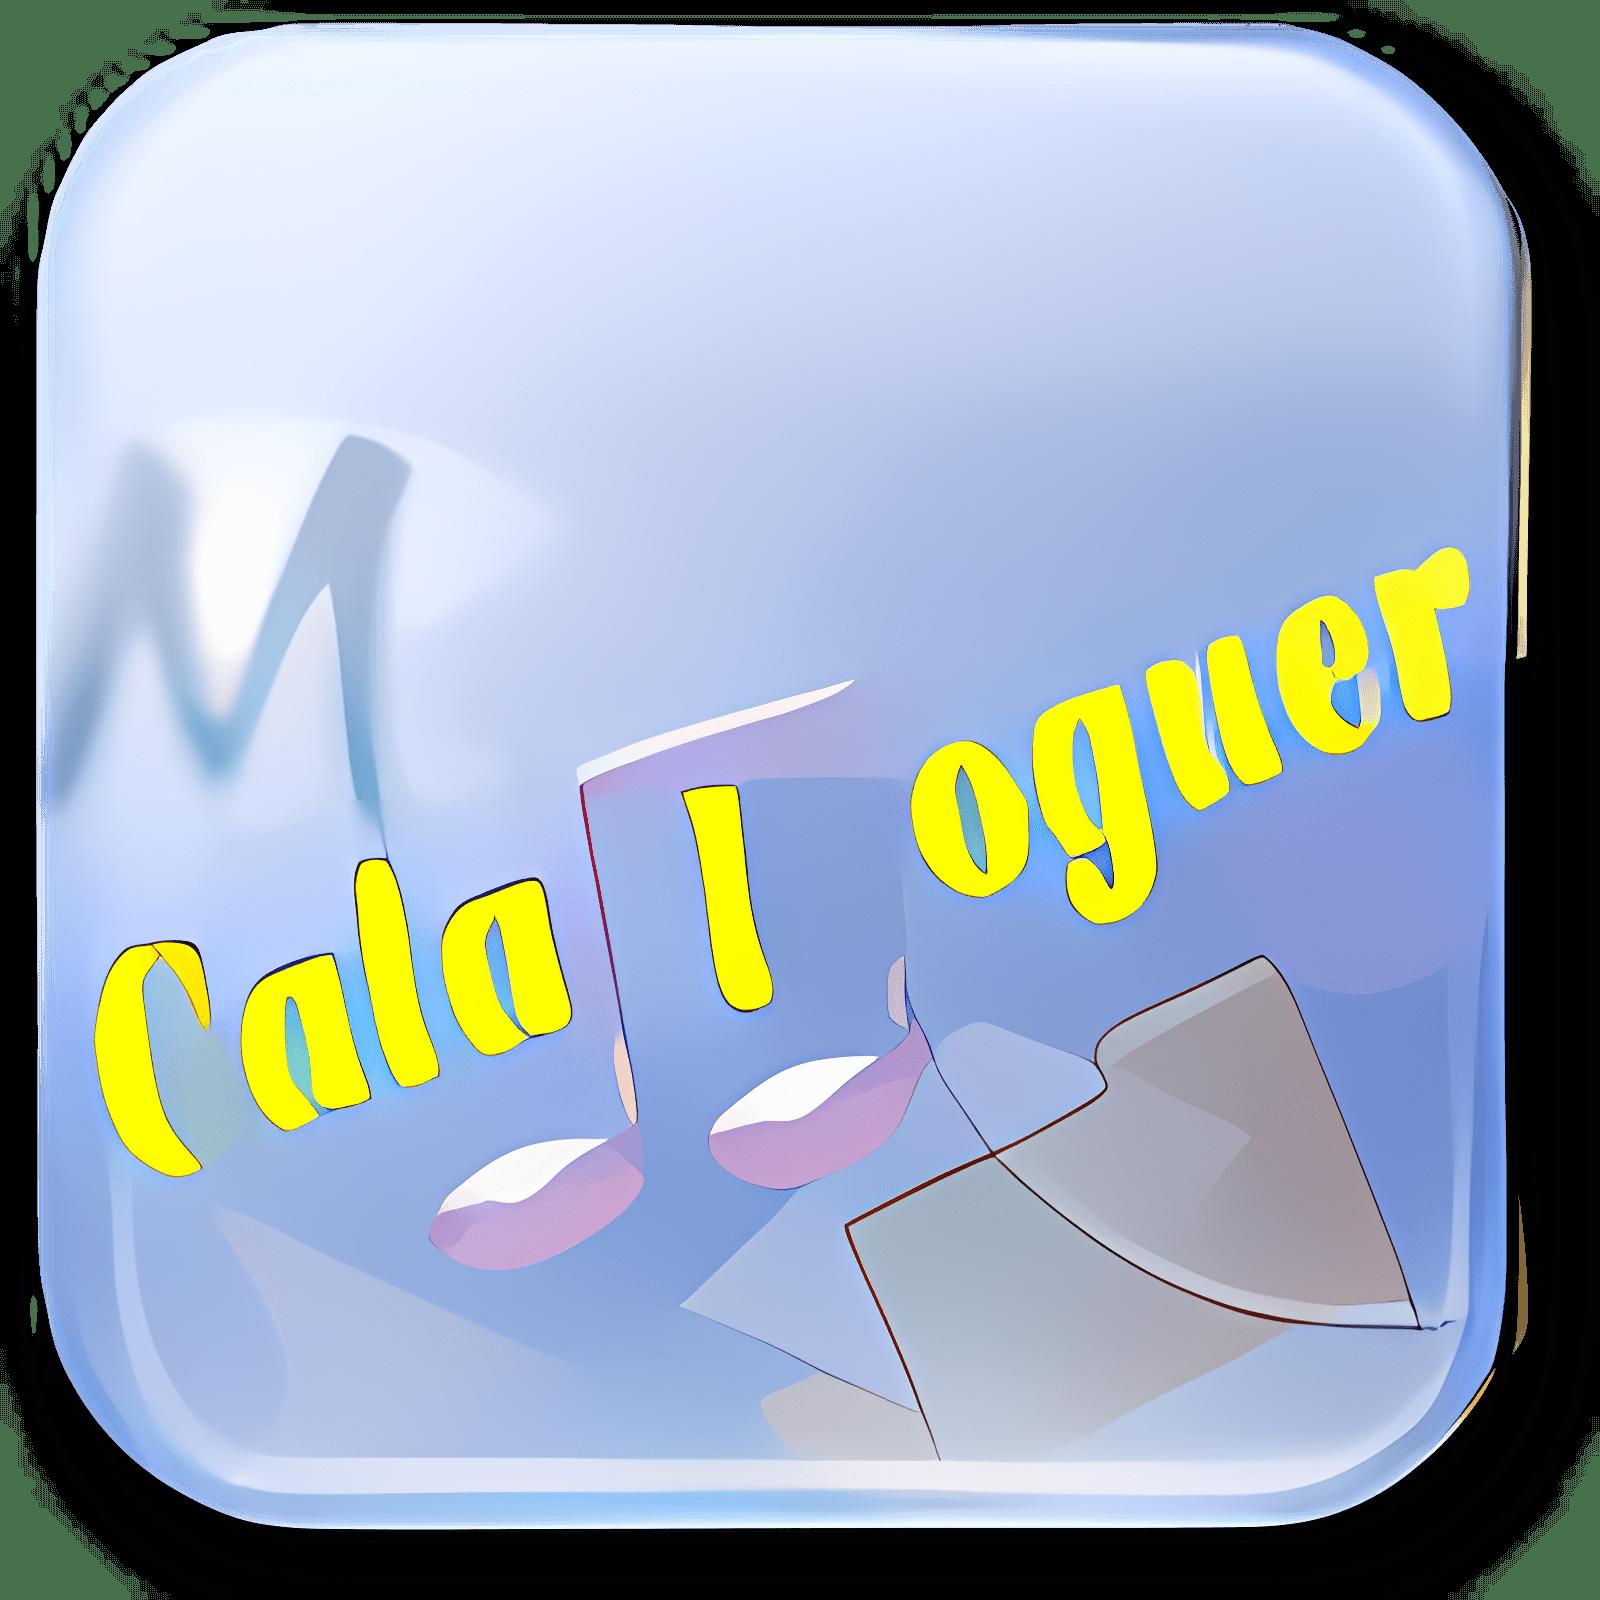 MCataloguer